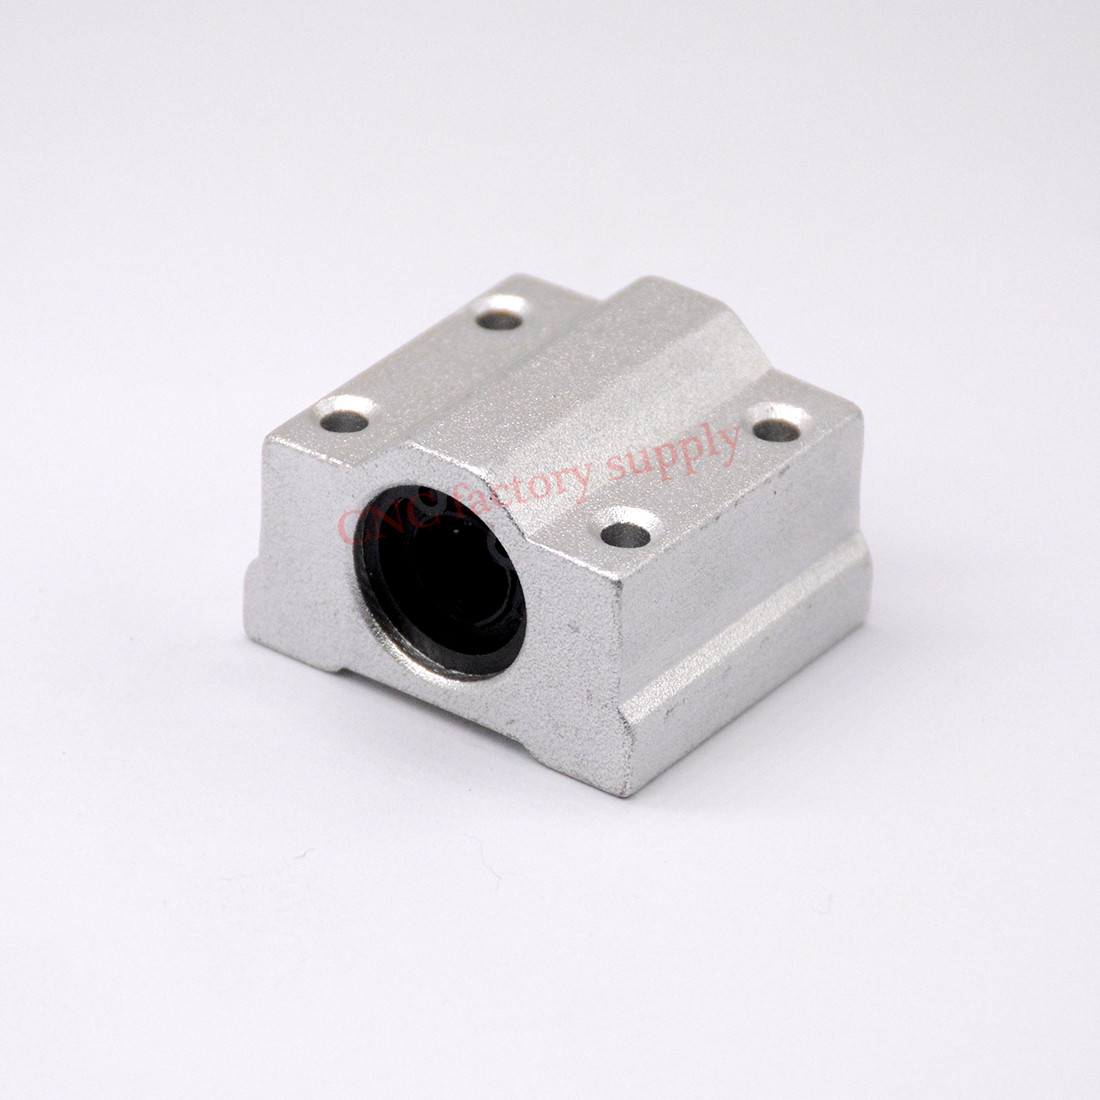 HOT sale 1pc SC12UU SCS12UU 12mm Linear Ball Bearing Block CNC Router hot sale 1pc lm12uu linear bushing 12mm cnc linear bearings